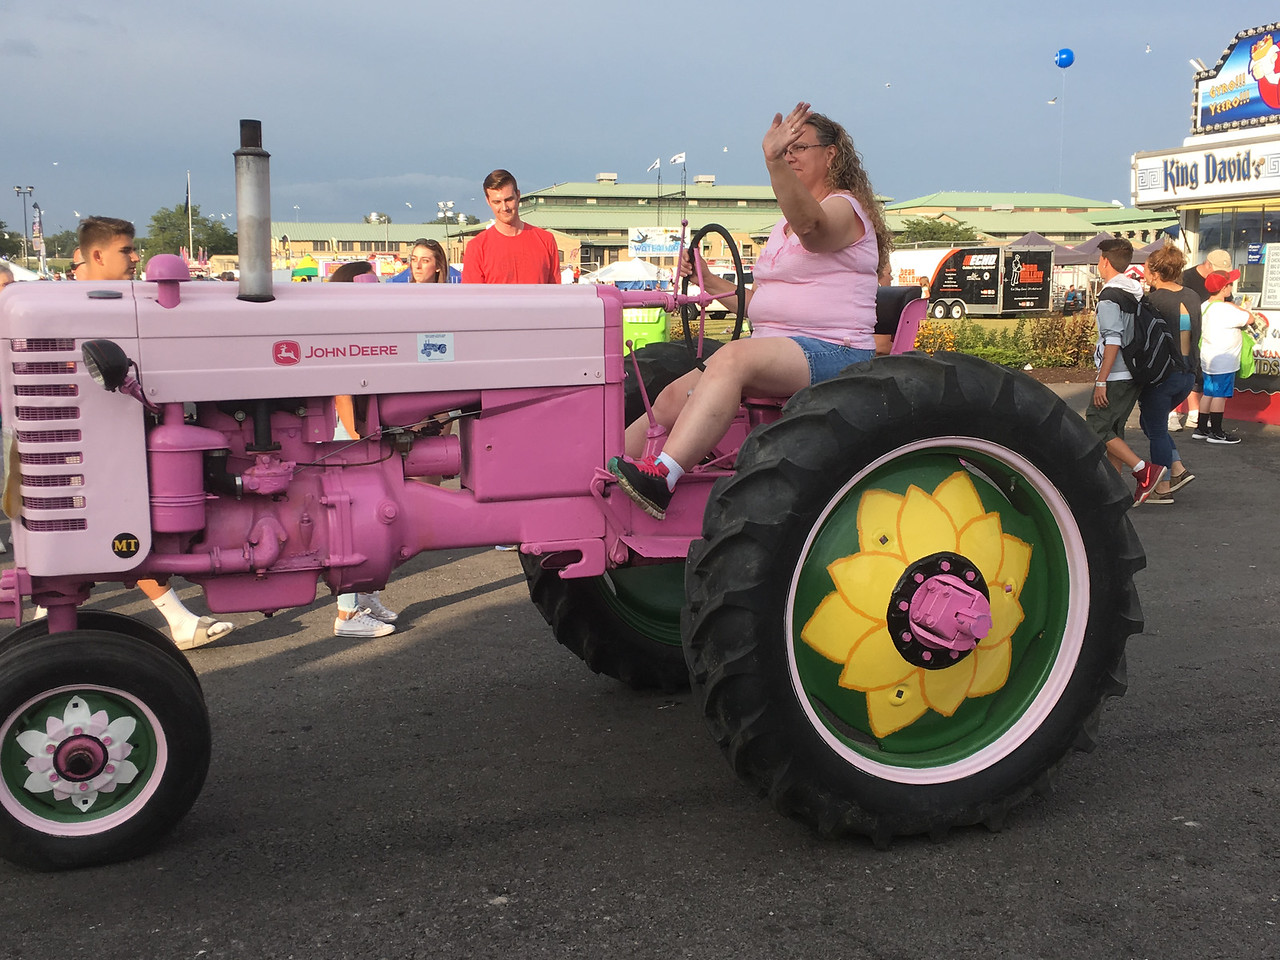 Karen Alvord - Oneida Daily Dispatch Fair goers enjoy the Great New York State Fair in Geddes on Monday, Aug. 28, 2017.